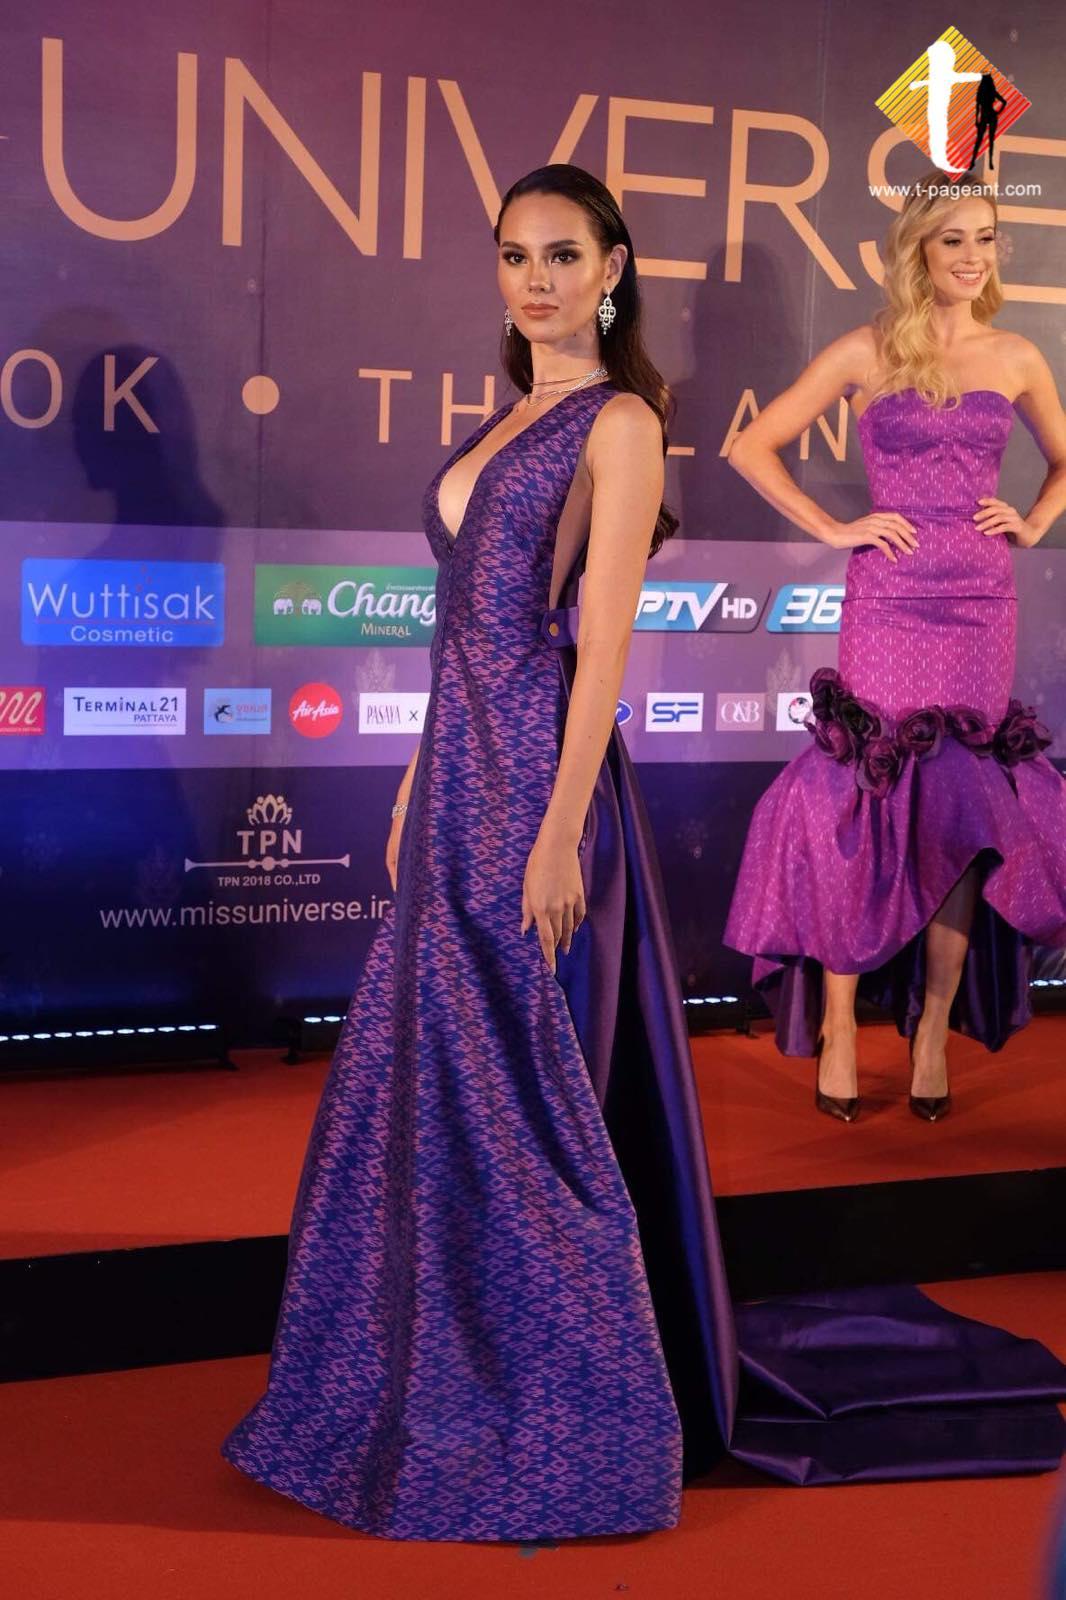 thai night gala dinner de candidatas a miss universe 2018. - Página 9 Lagh67gt